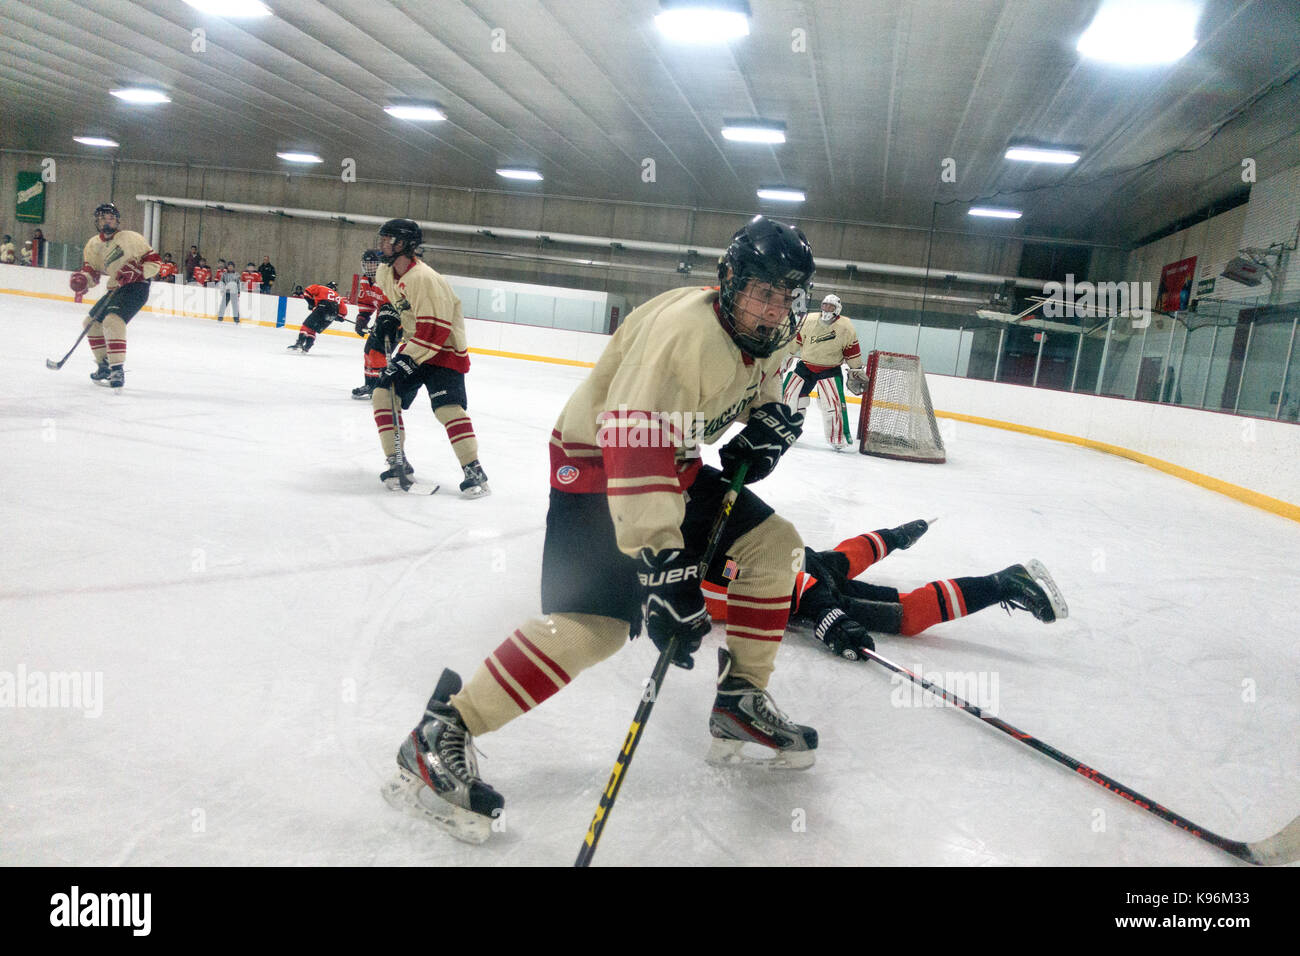 Intense game of hockey played by high school teen boys. St Paul Minnesota MN USA - Stock Image